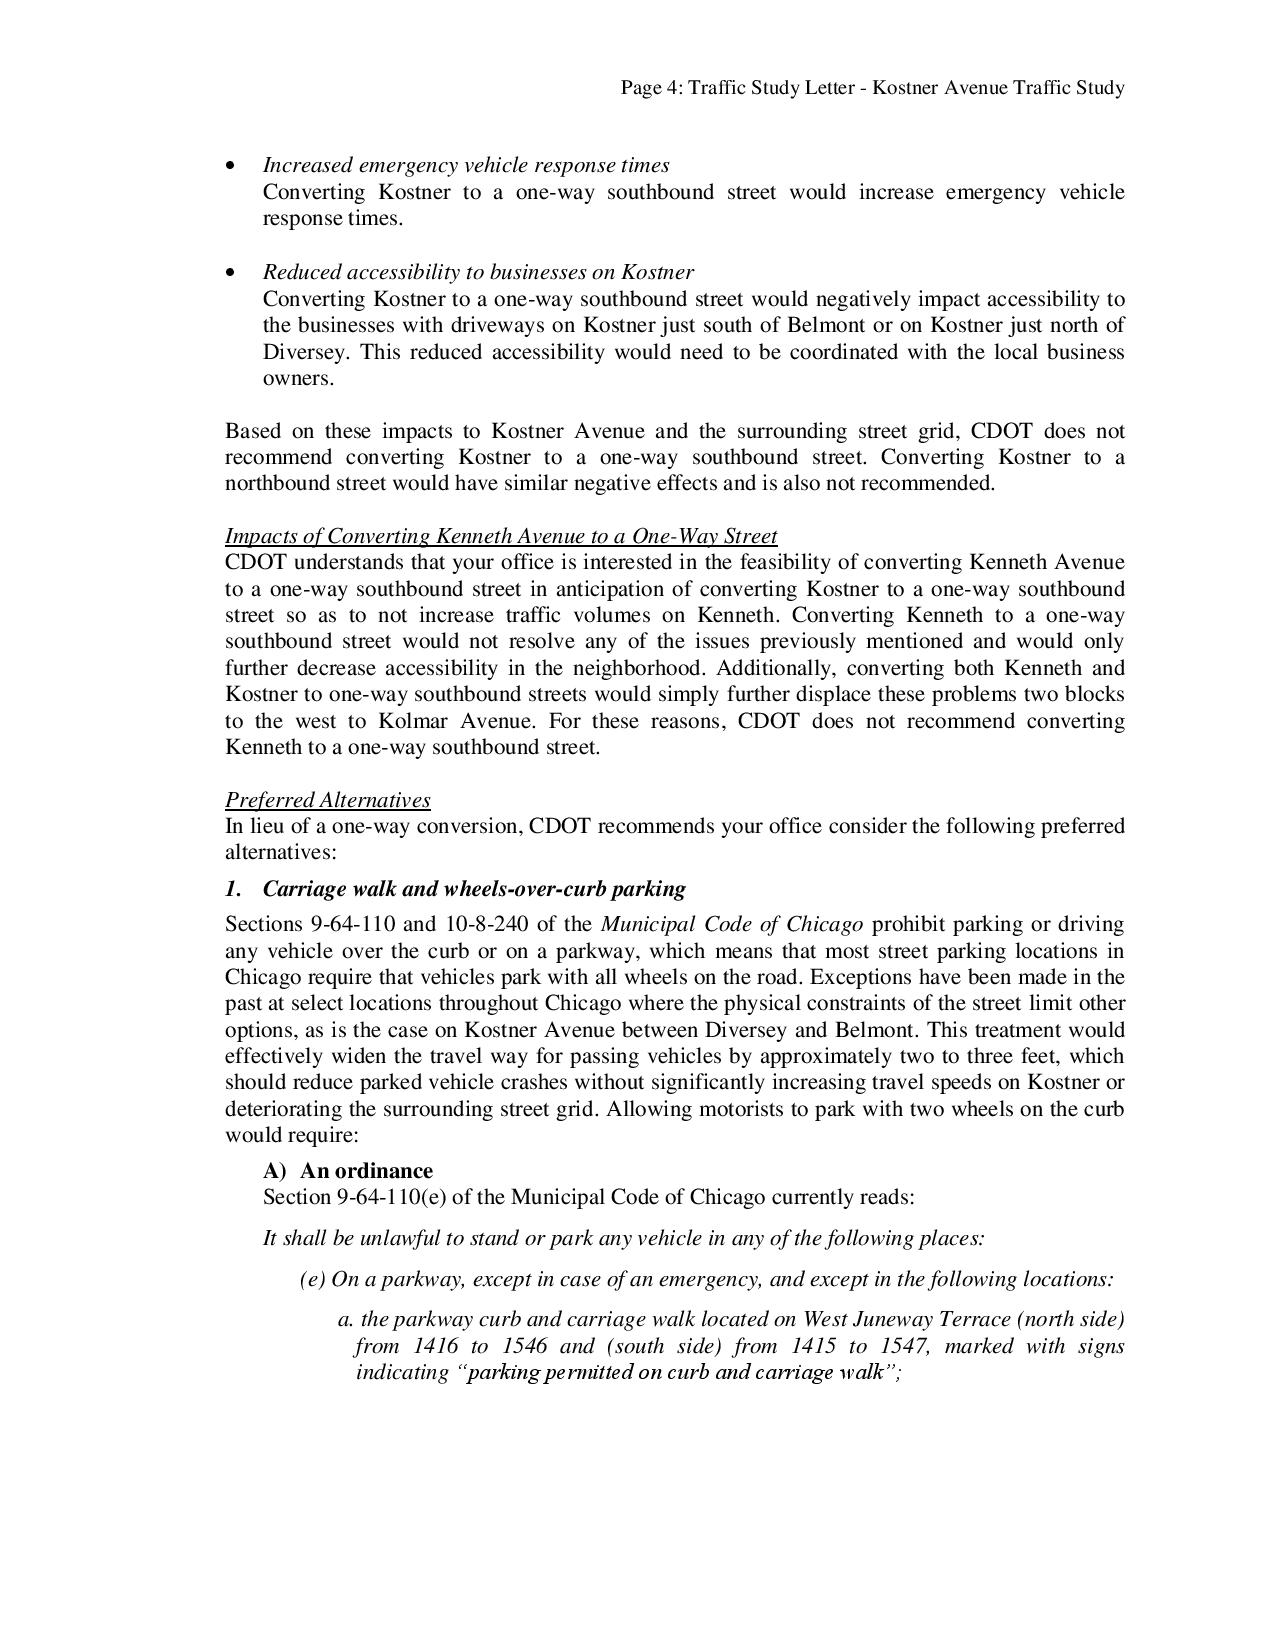 Kostner_Avenue_Traffic_Study_Letter-page-004.jpg